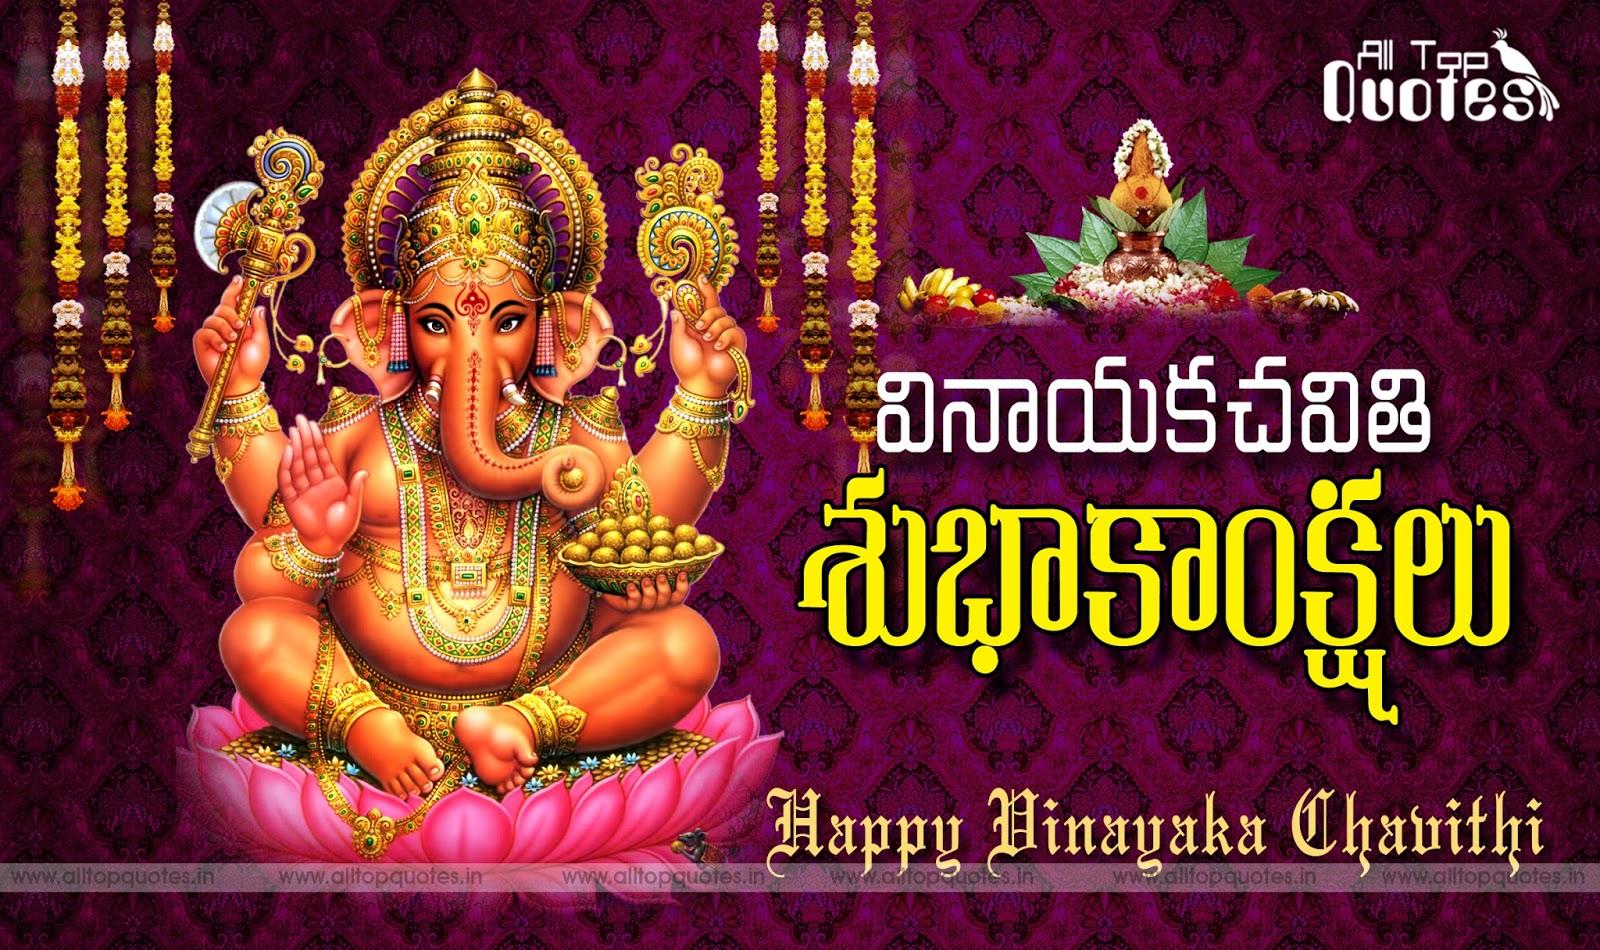 Ganesh chaturthi 2016 message quotes wishes in hindi english urdu ganesh2bchaturthi2b20162bmessage2bquotes2bwishes2bin2bhindi m4hsunfo Gallery